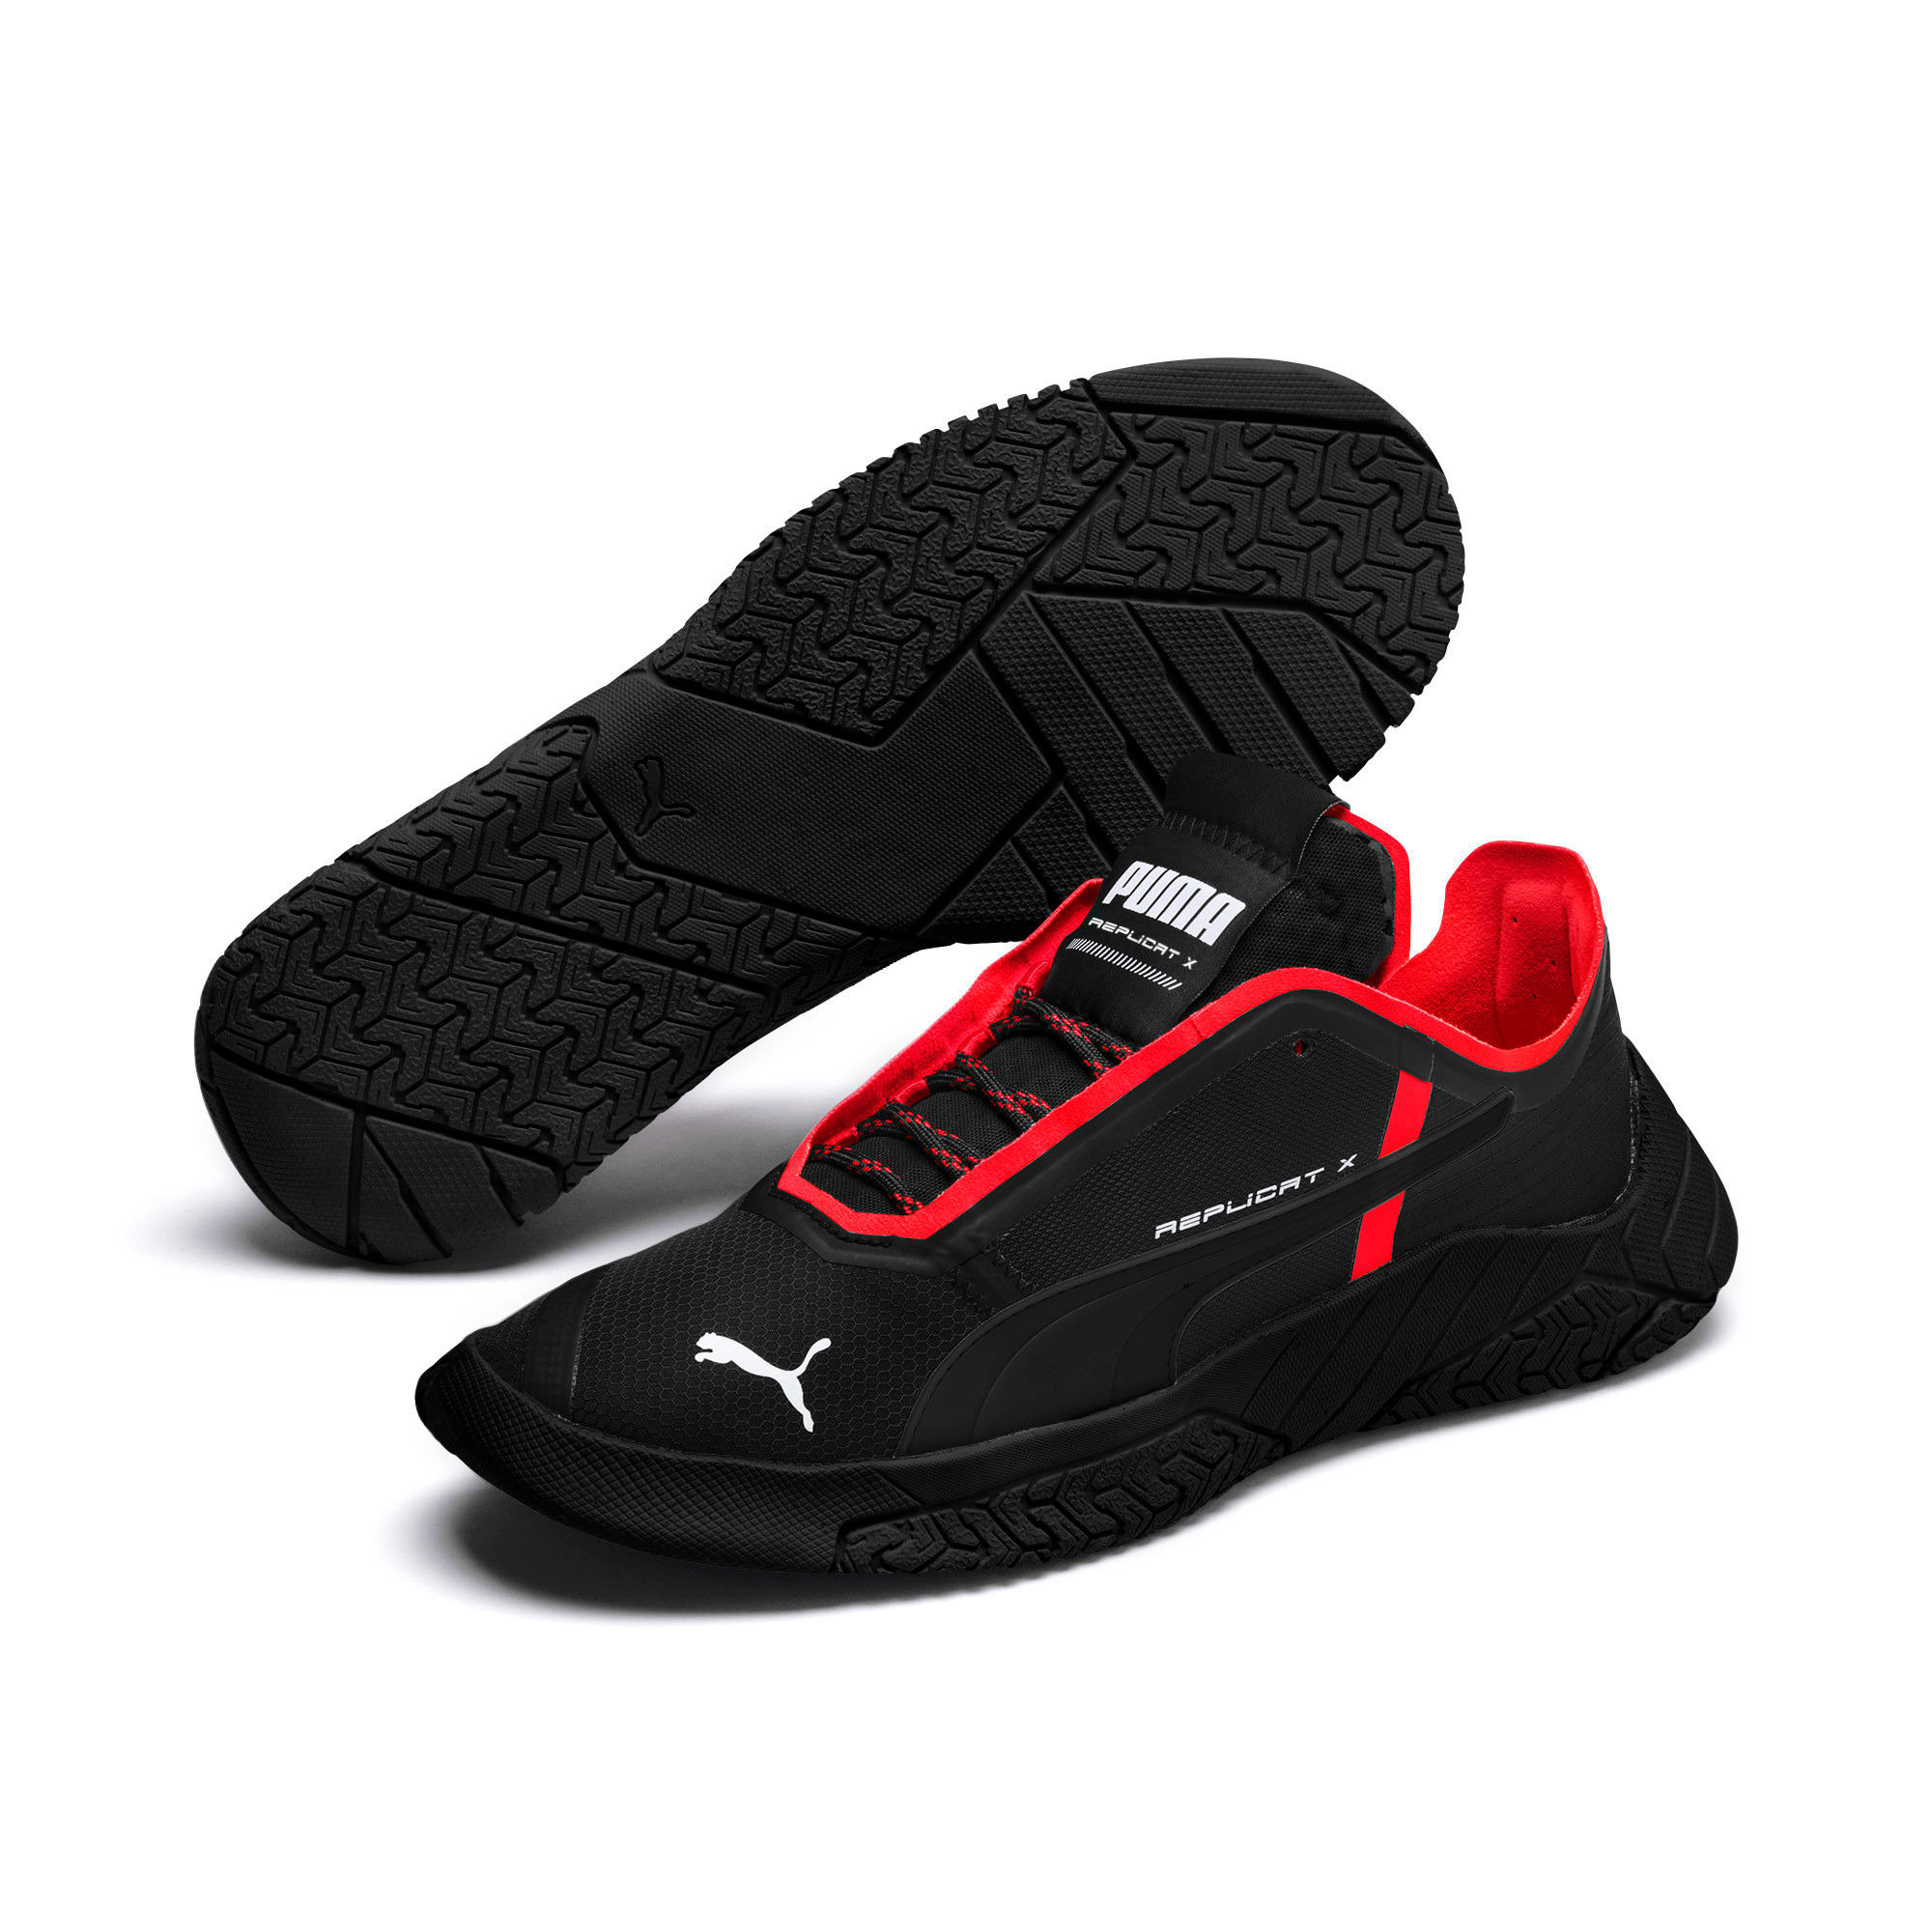 Thumbnail 2 of Replicat-X Circuit Trainers, Puma Black-Puma Red, medium-IND